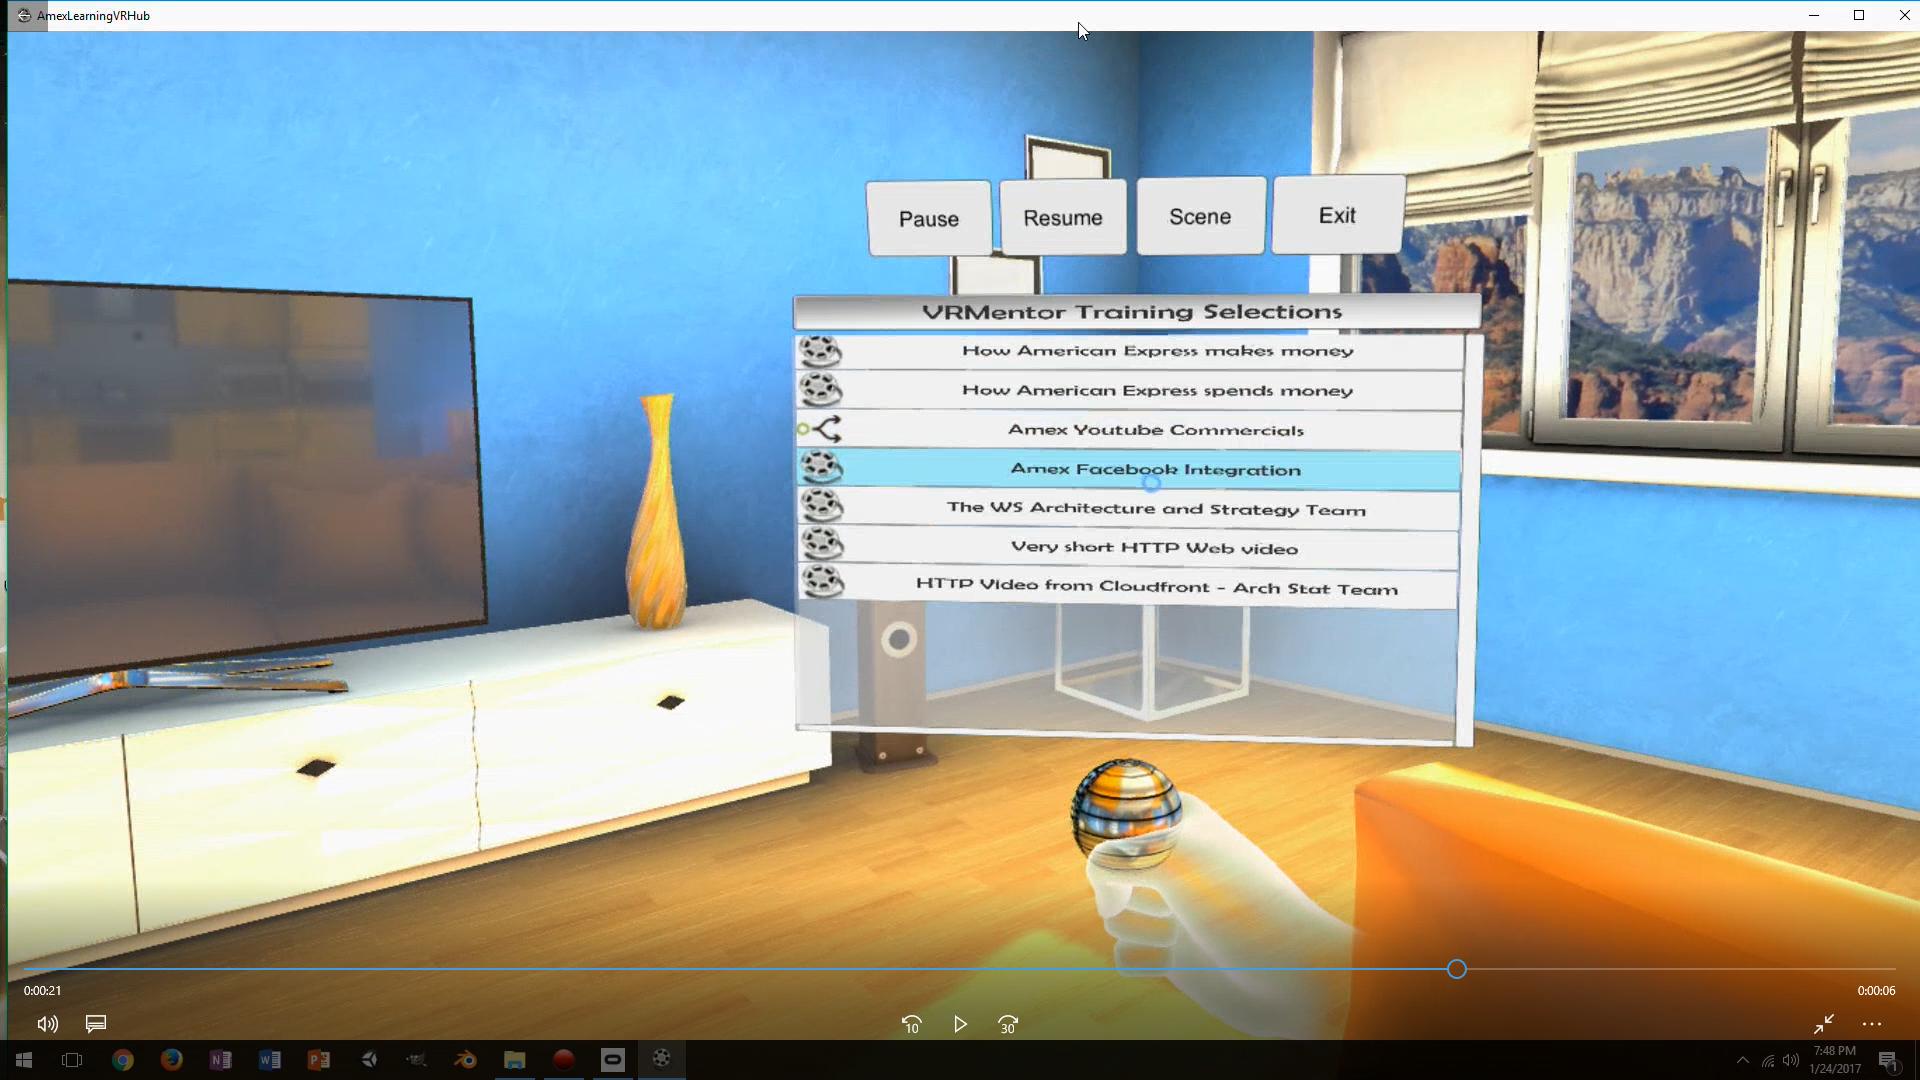 VRMentor (VR video training system)